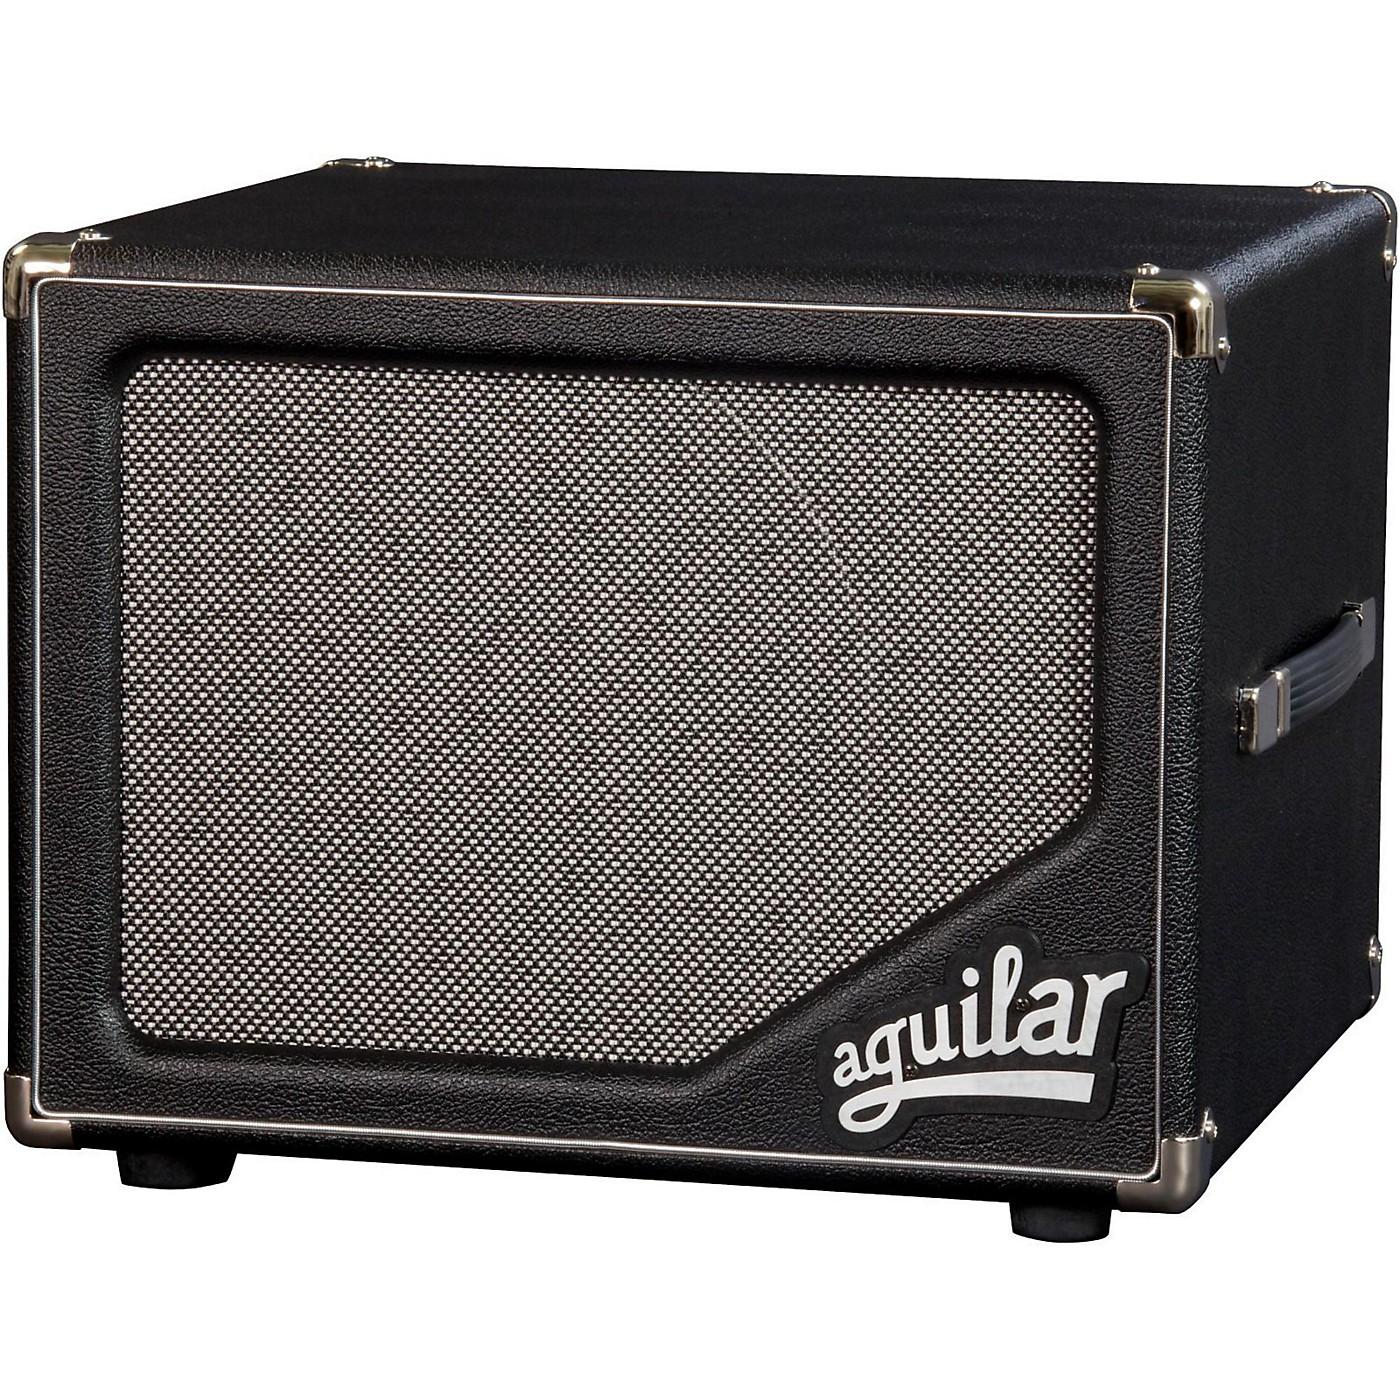 Aguilar SL 112 1x12 Bass Speaker Cabinet thumbnail